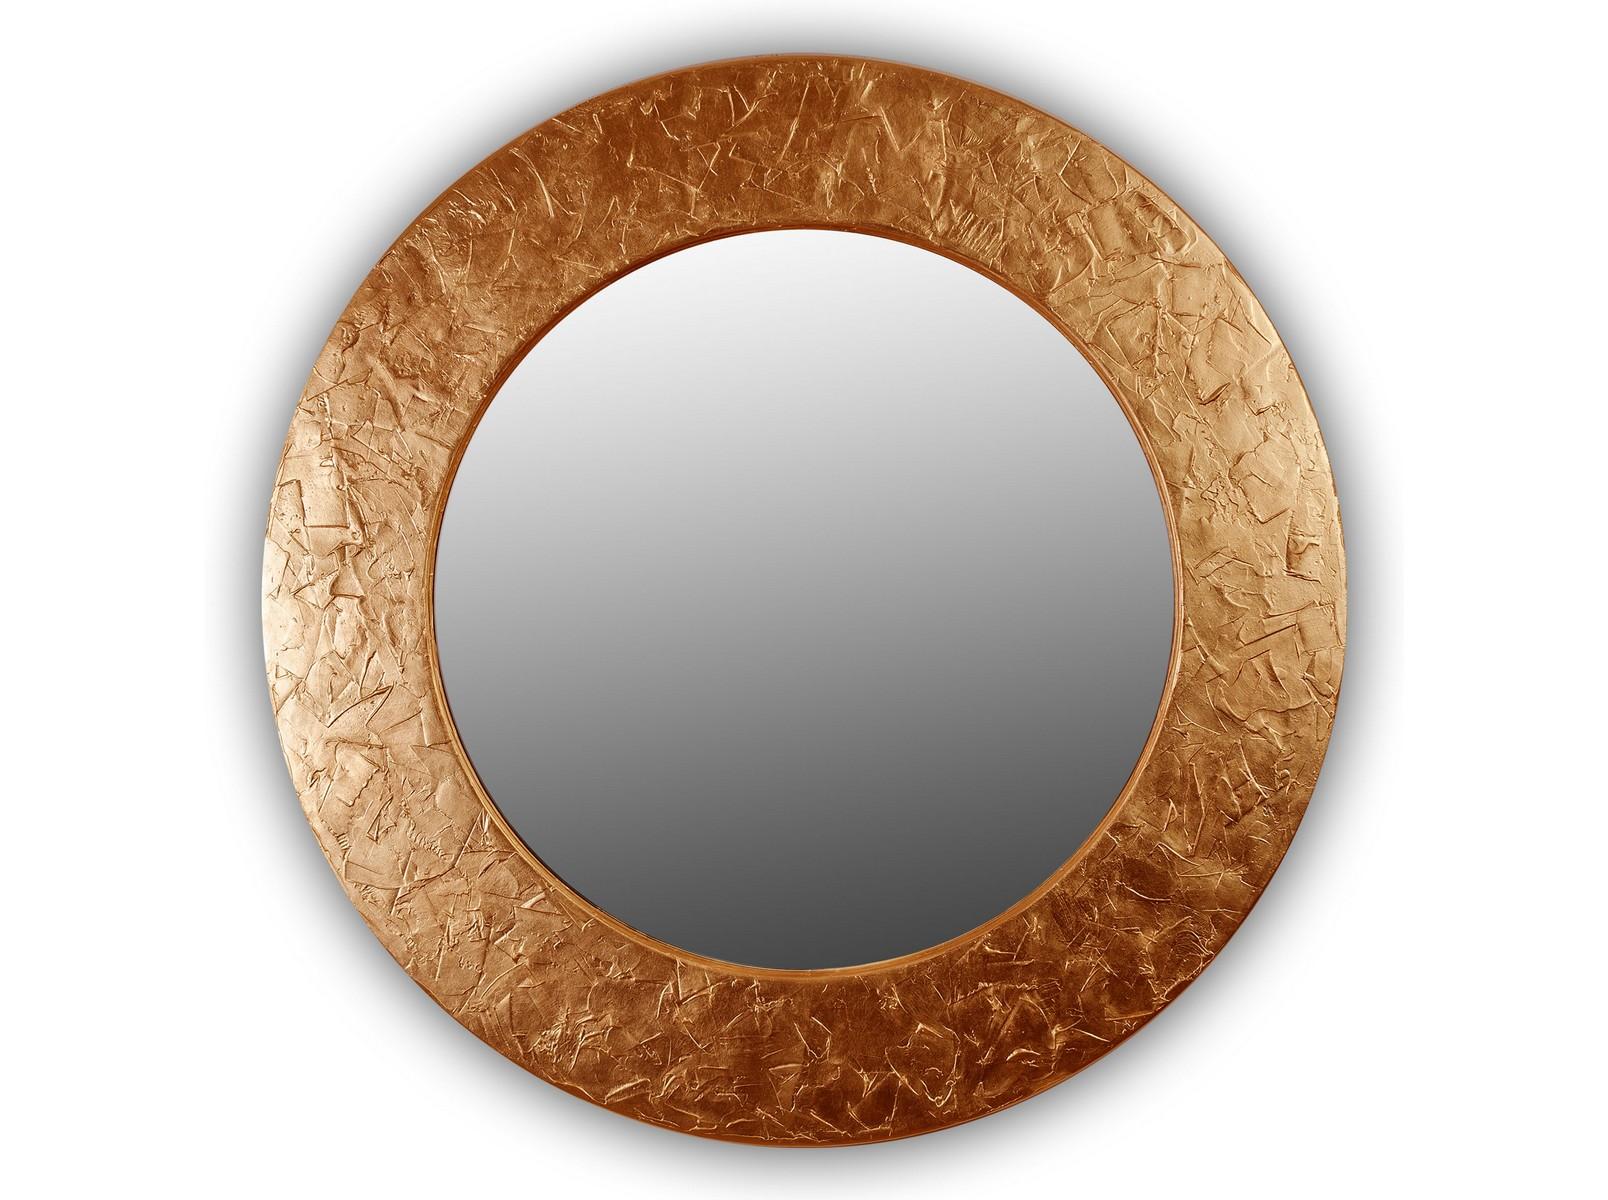 Зеркало FASHION STROKESНастенные зеркала<br>Данный вариант представлен в бронзовом цвете.<br><br>Material: Дерево<br>Depth см: 4,2<br>Diameter см: 90